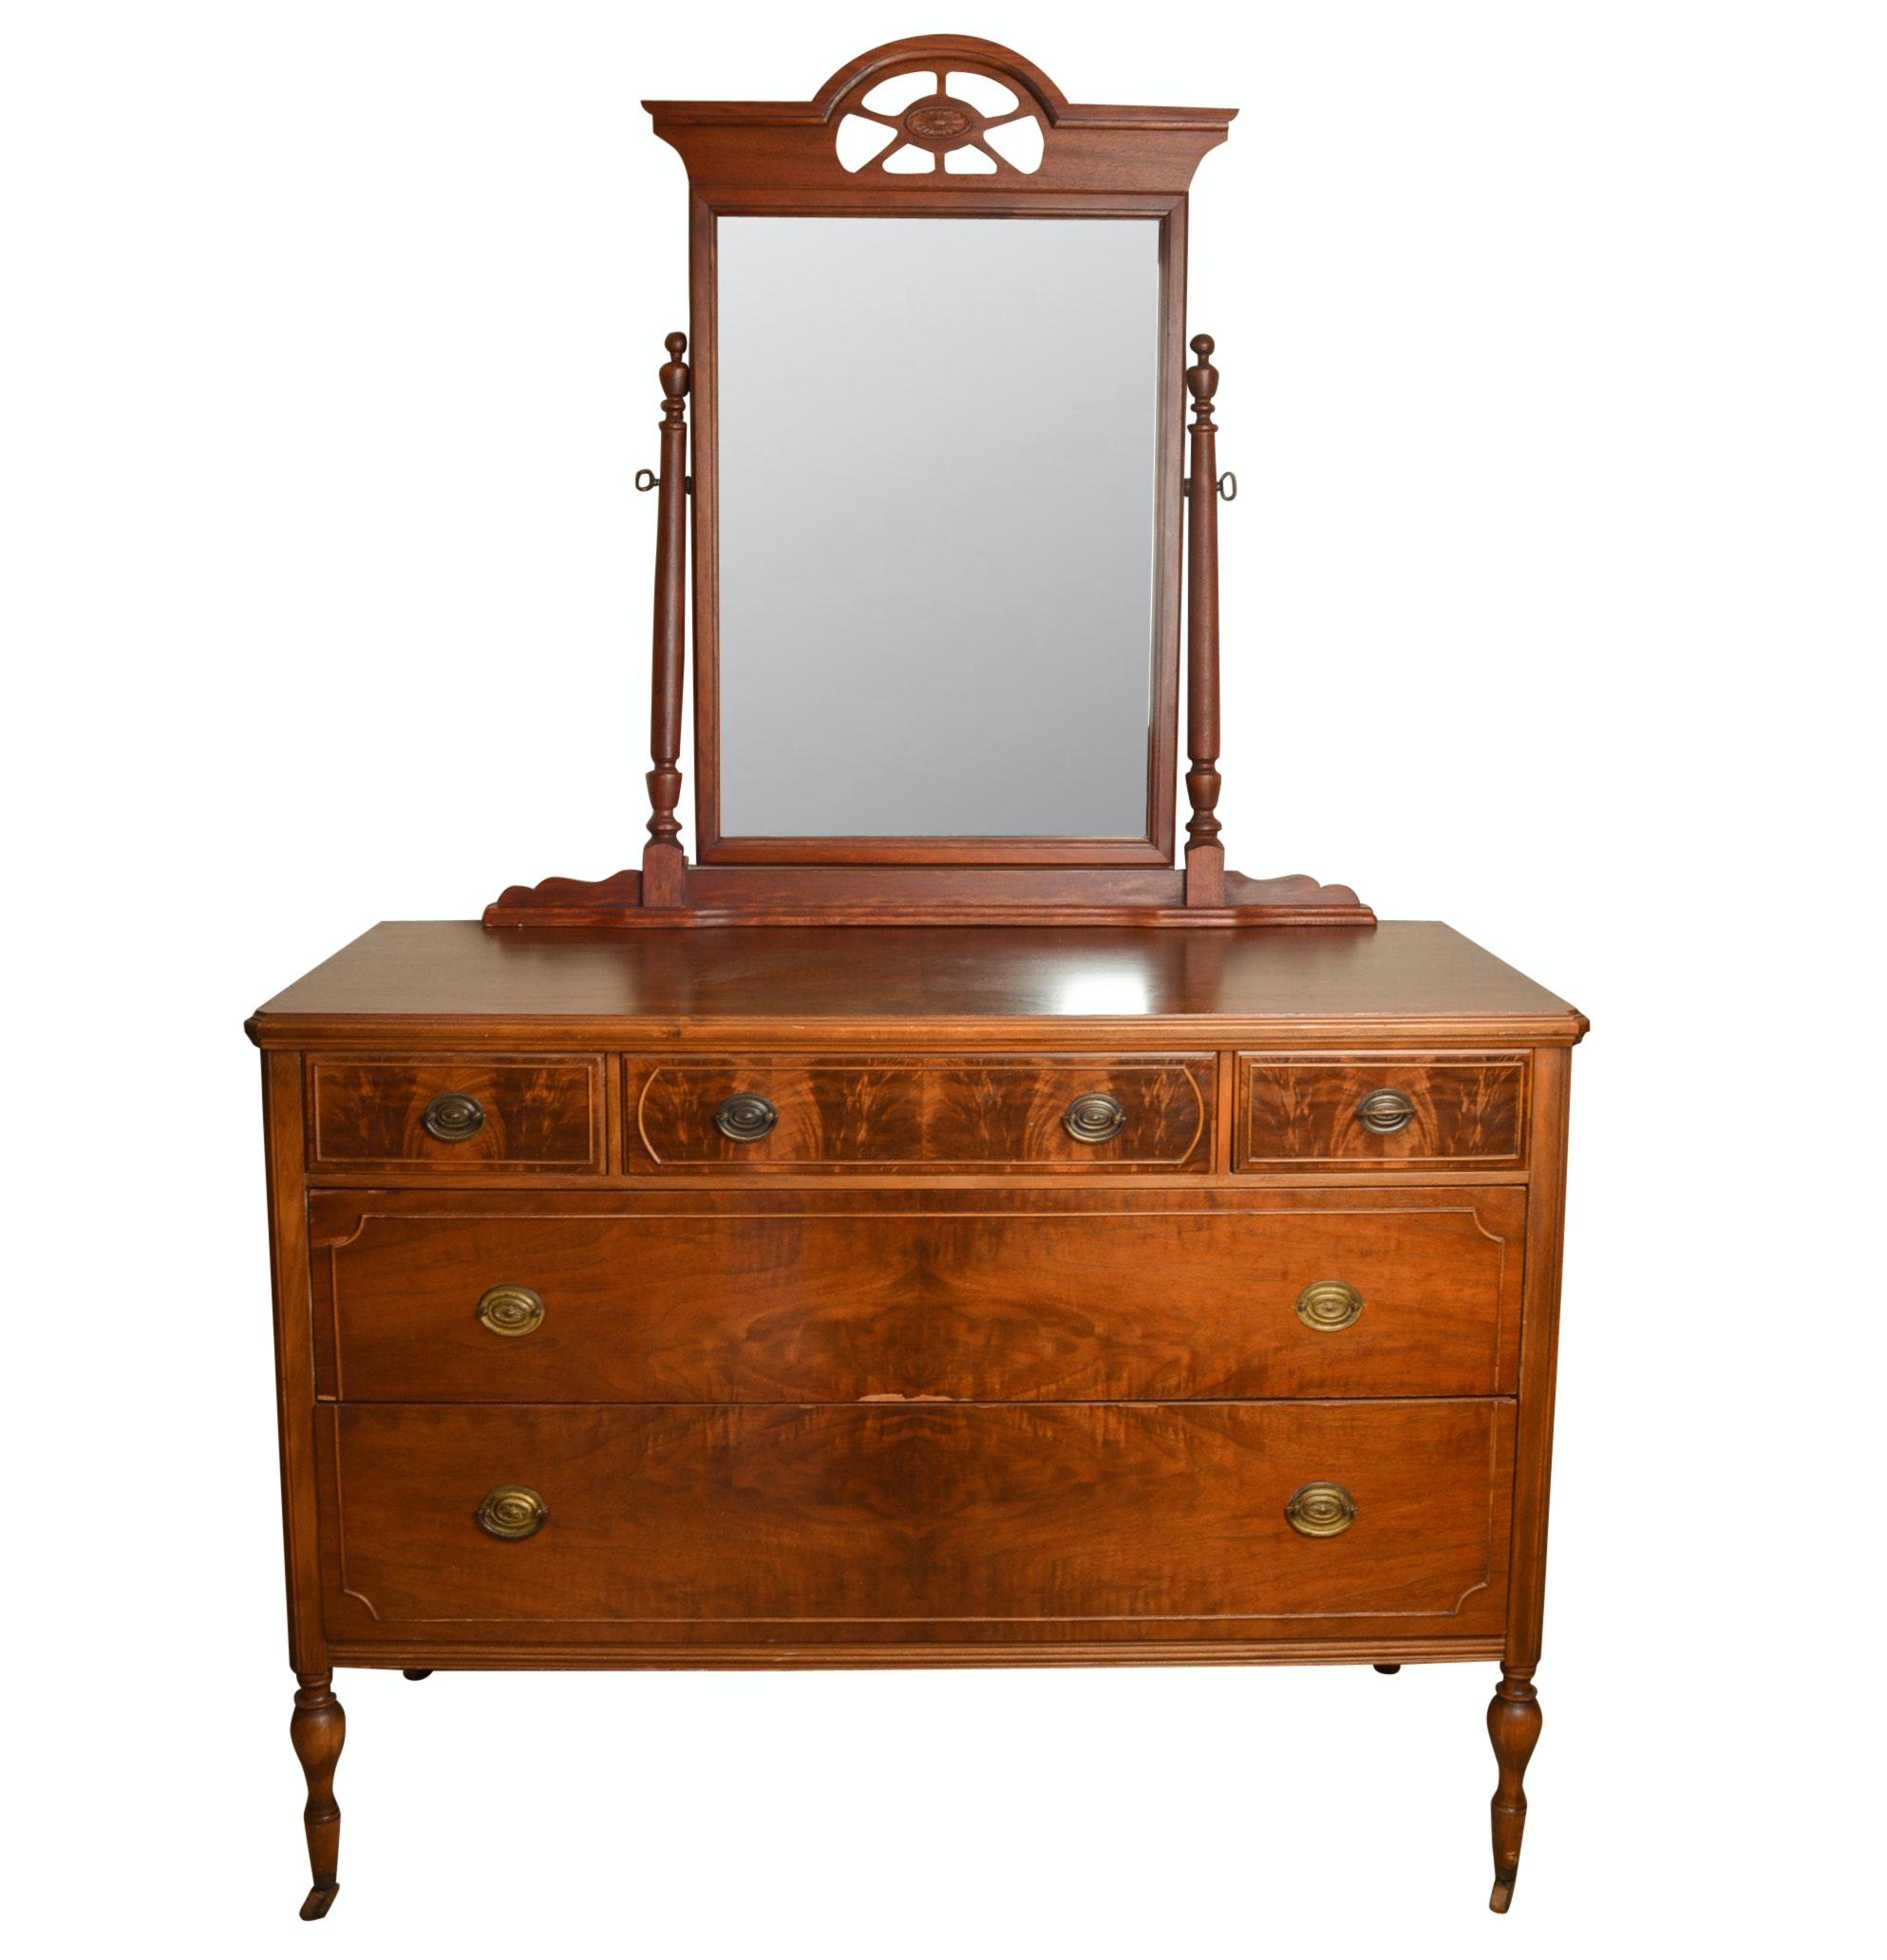 Ordinaire Antique To Vintage Sligh Furniture Company Dresser ...